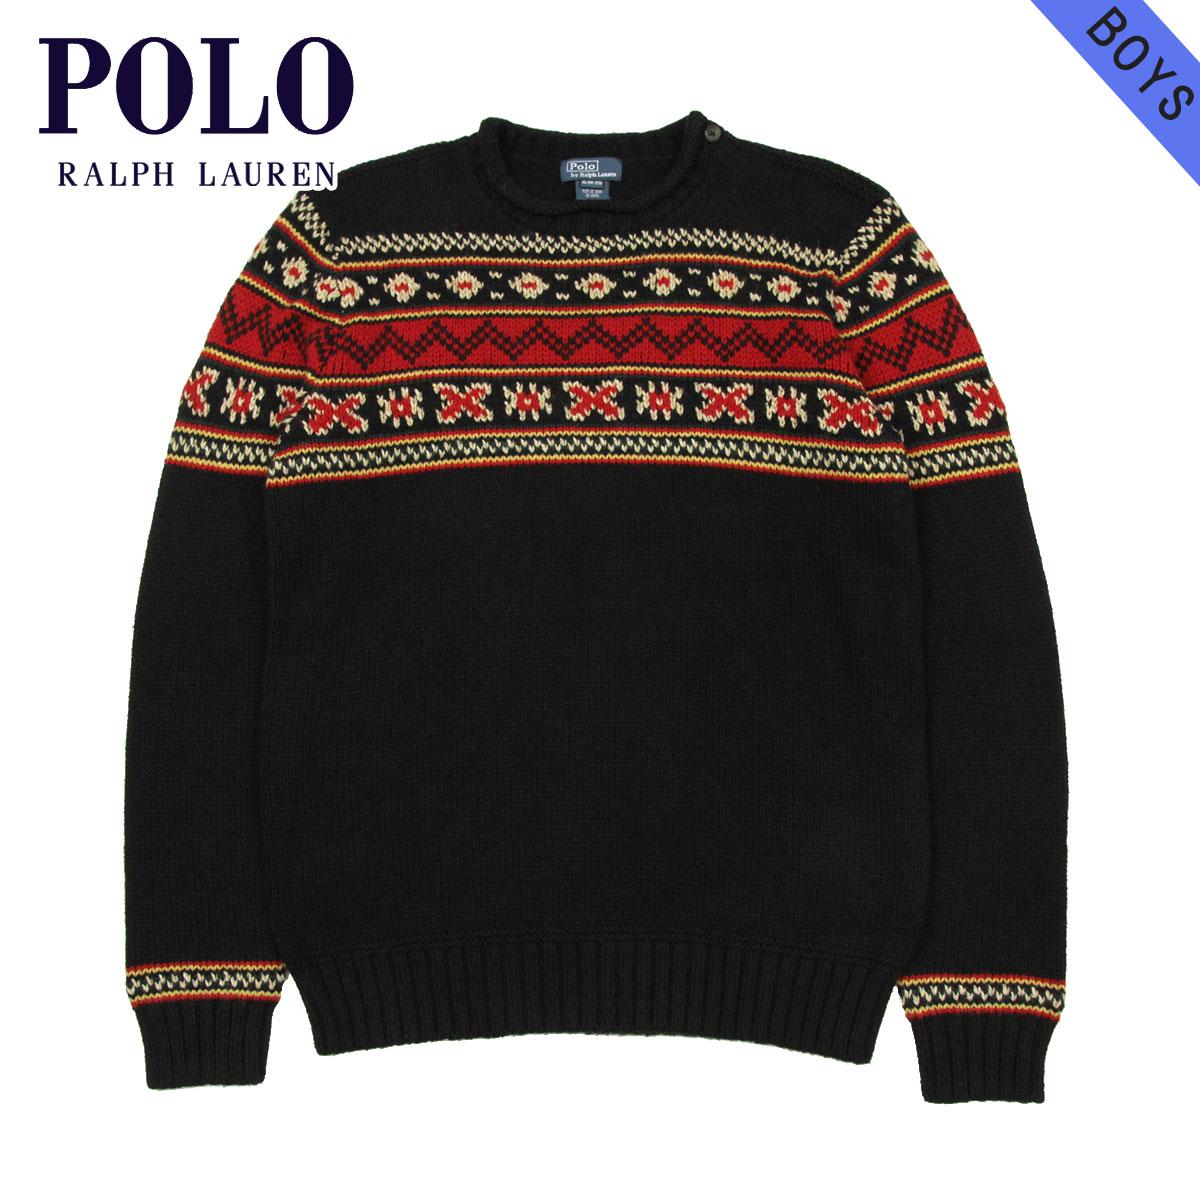 d56157781 Rakuten Ichiba shop MIXON  30%OFF sale polo Ralph Lauren kids POLO RALPH  LAUREN CHILDREN regular article children s clothes Boys sweater CREW NECK  SWEATER ...